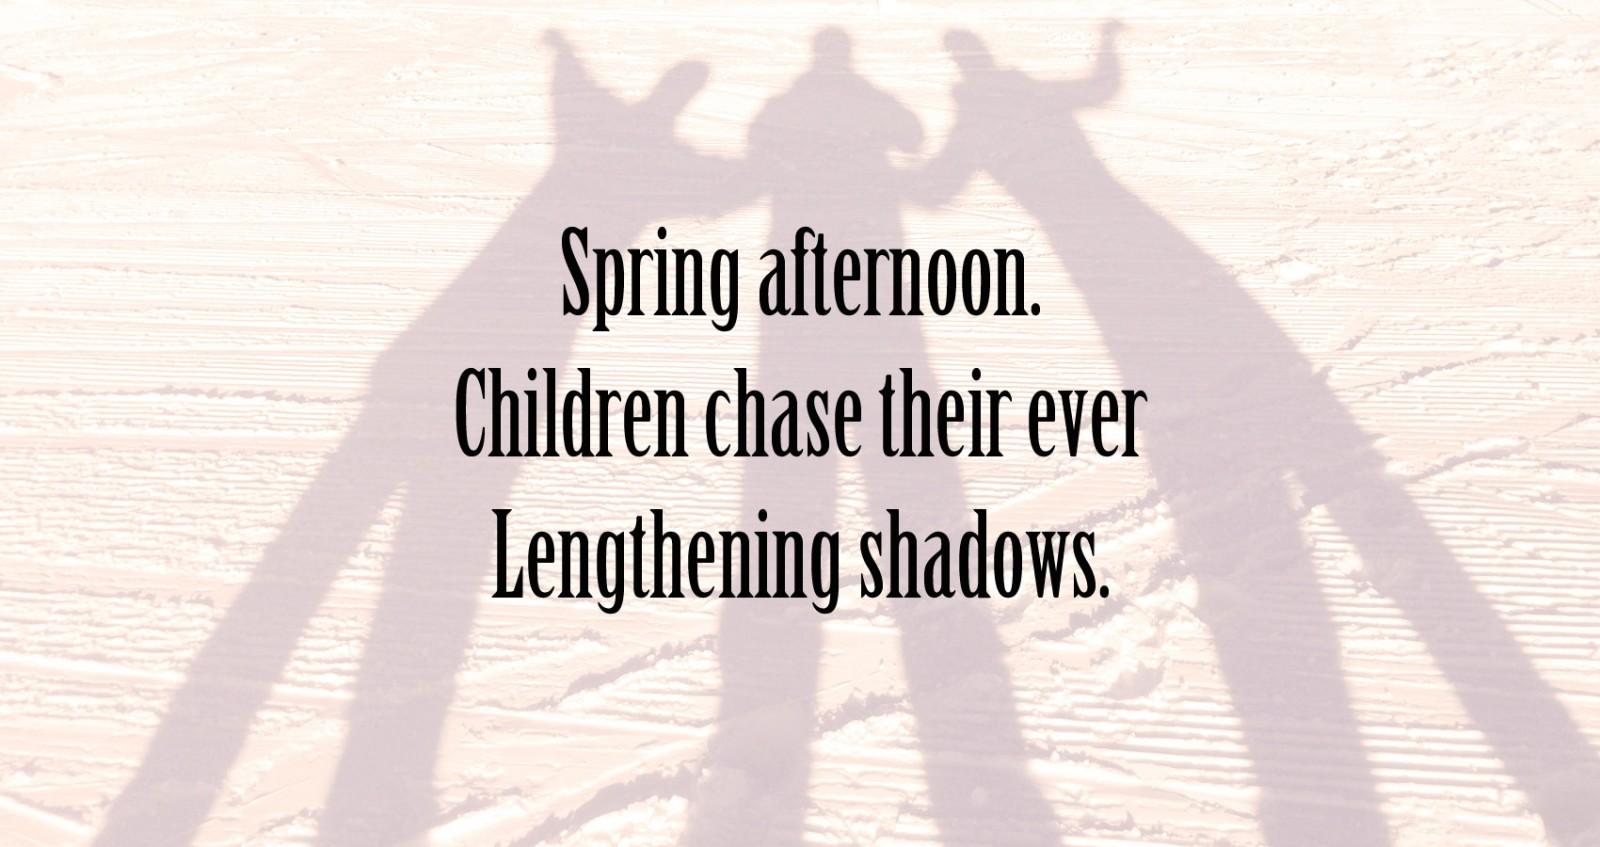 Spring afternoon